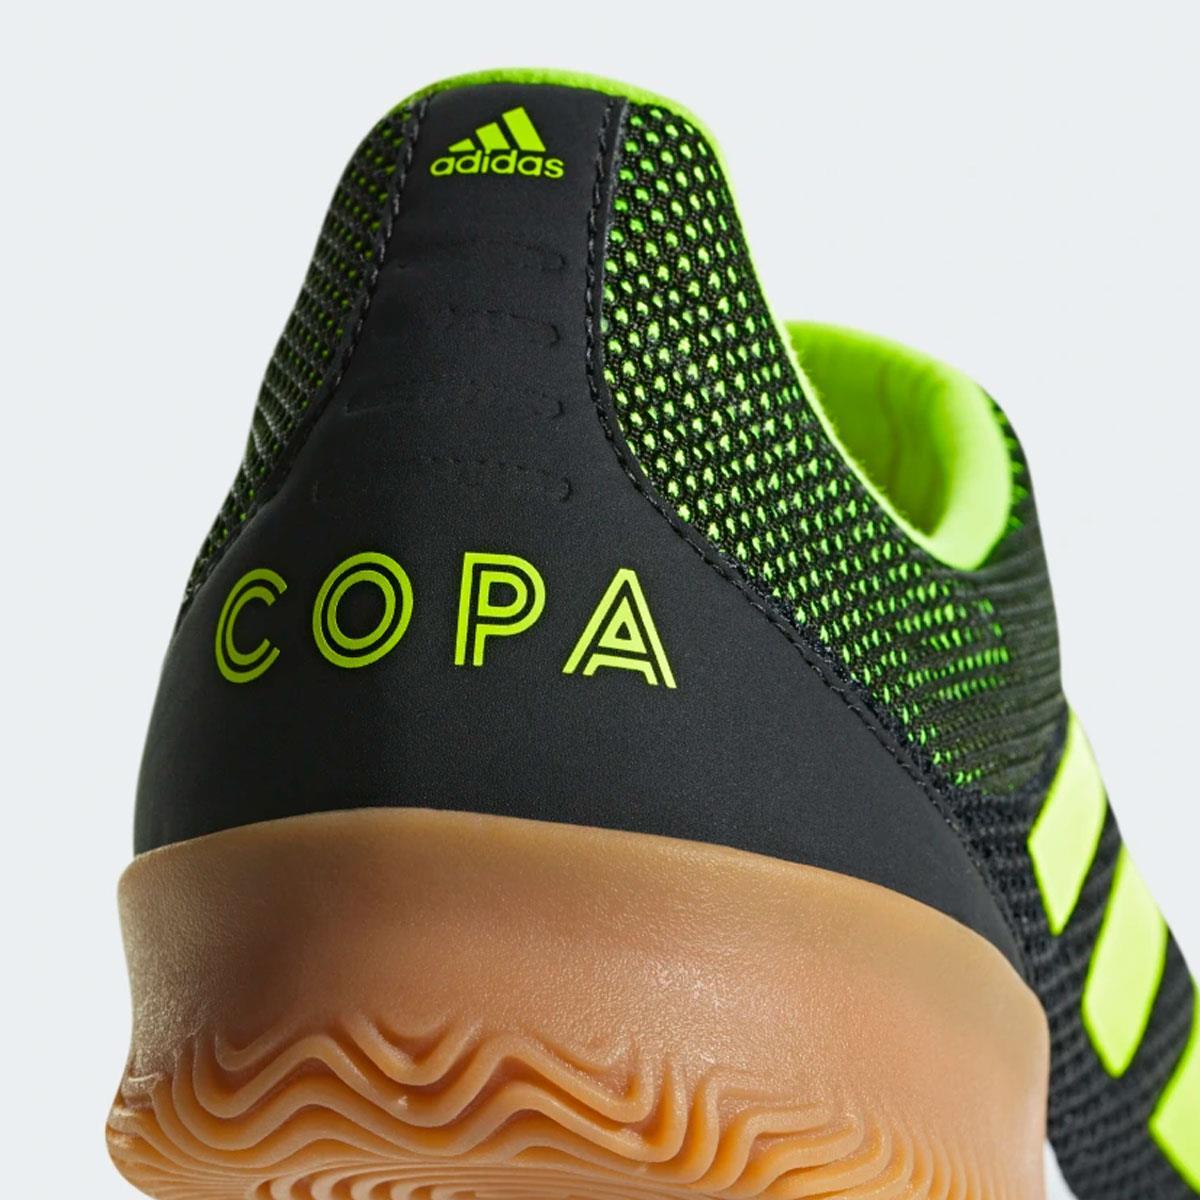 2d3349e6a2 Chuteira Adidas Futsal Sala Copa 19.3